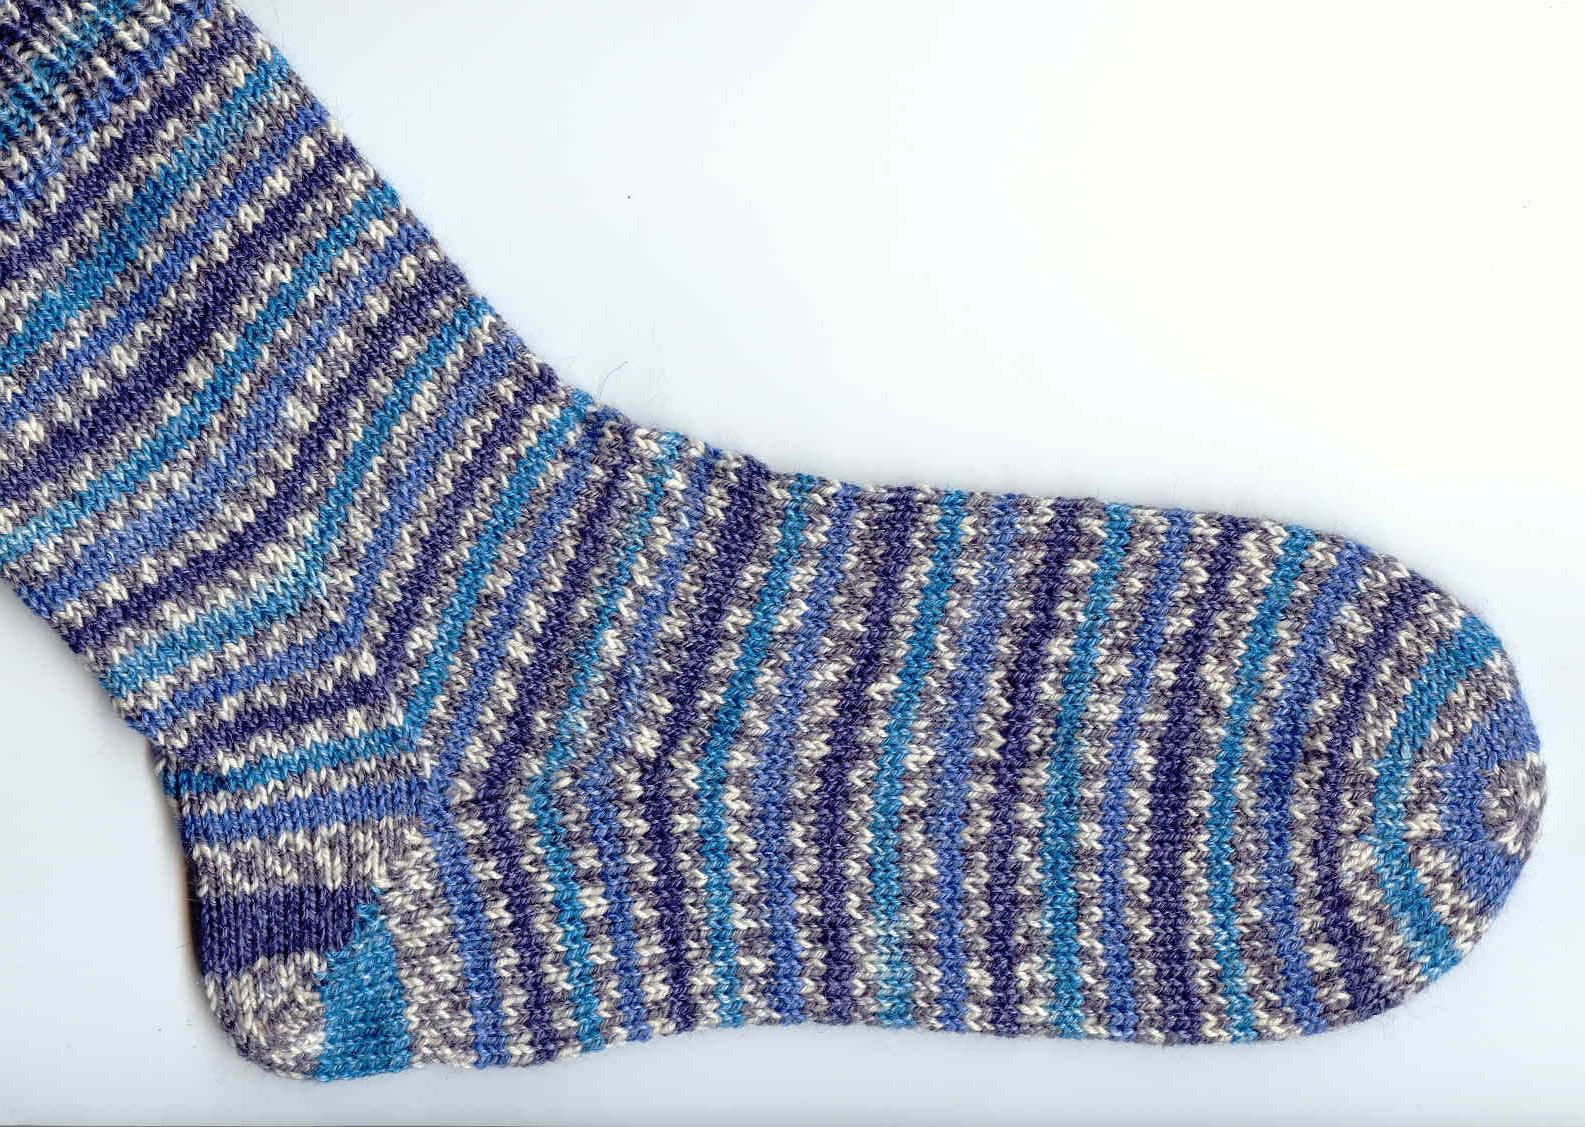 Sock Yarn : Saras Colorwave Blog: PATTERNED SOCK YARNS